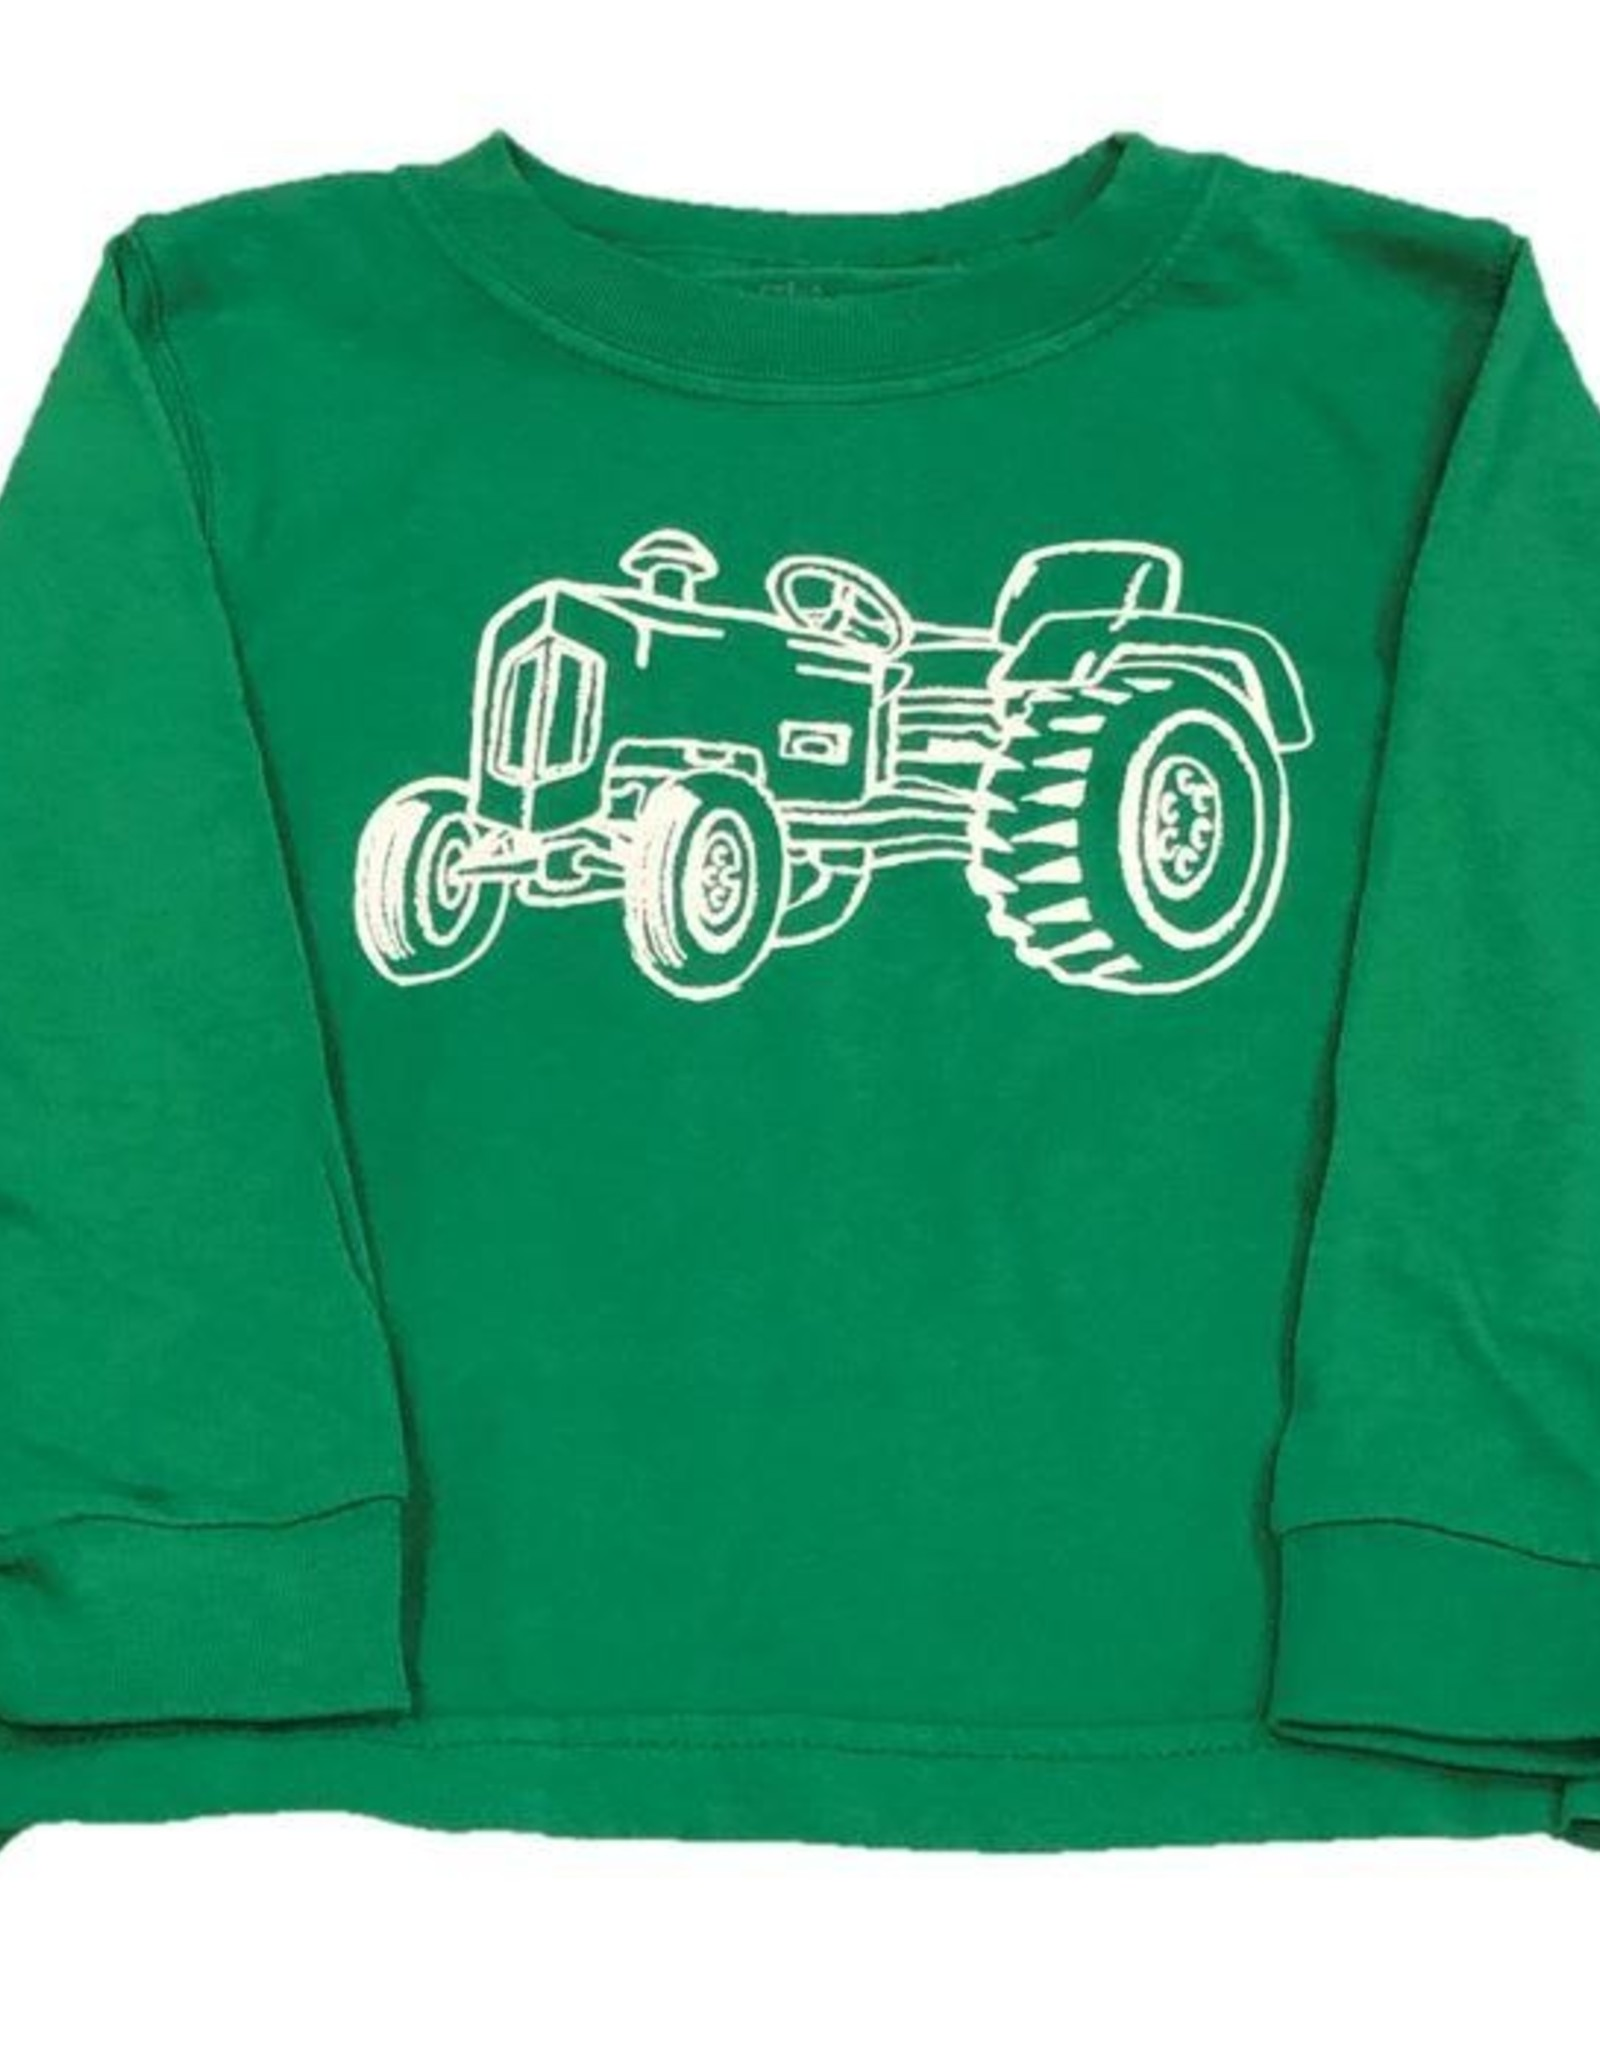 Mustard & ketchup LS Grass Green Tractor Tshirt